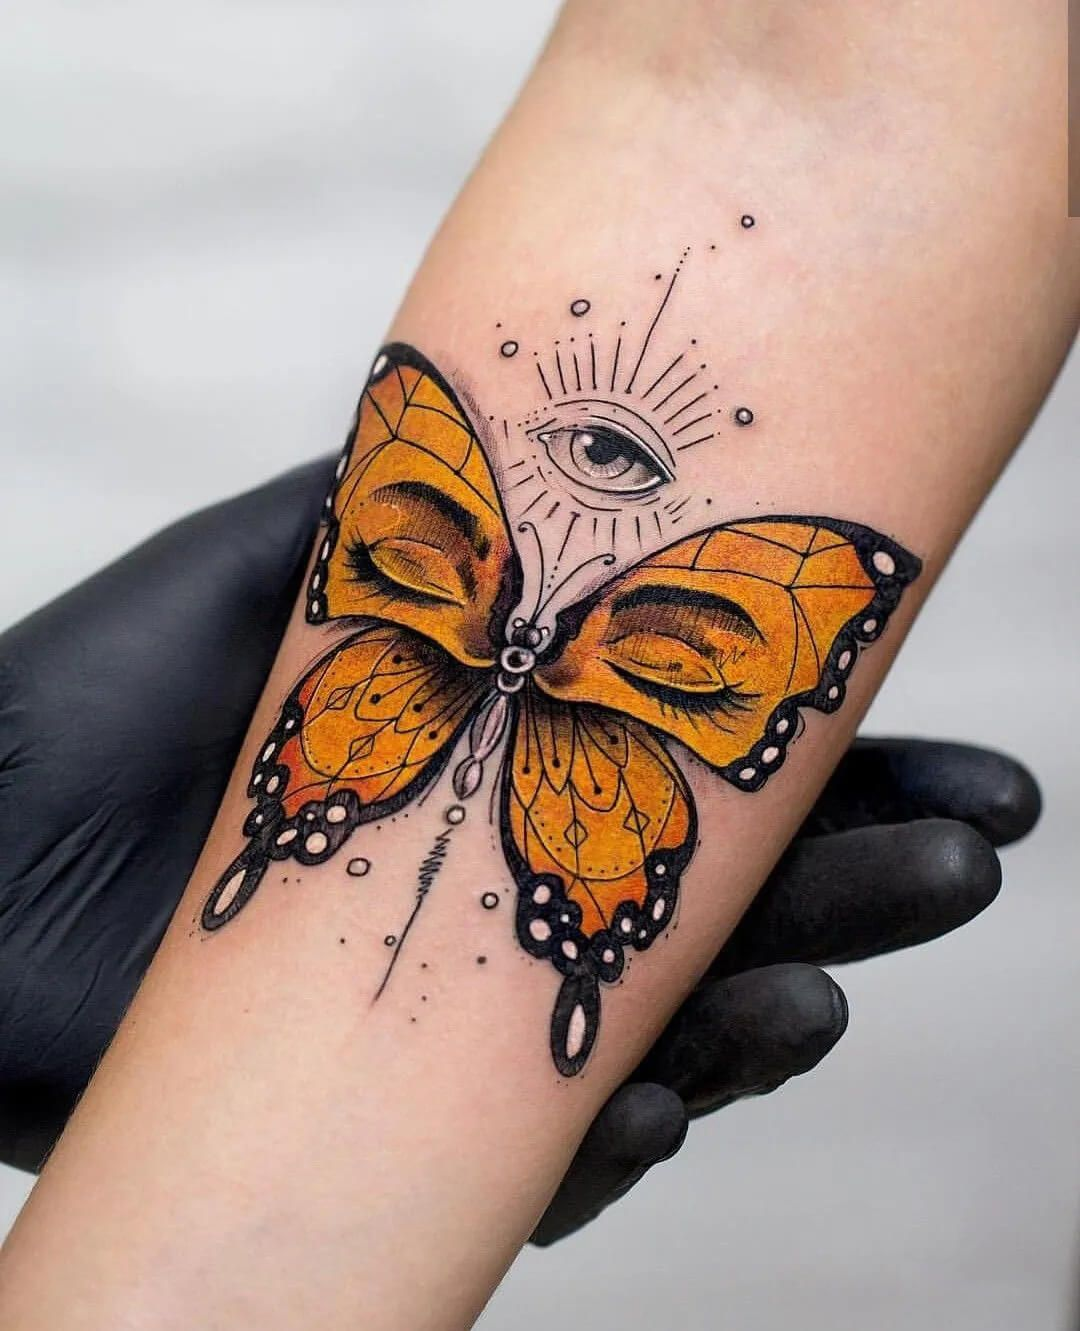 Tattoo Manuscript Material Issue 10 Eyes Tattoos Design In 2020 Unique Butterfly Tattoos Eye Tattoo Tattoos